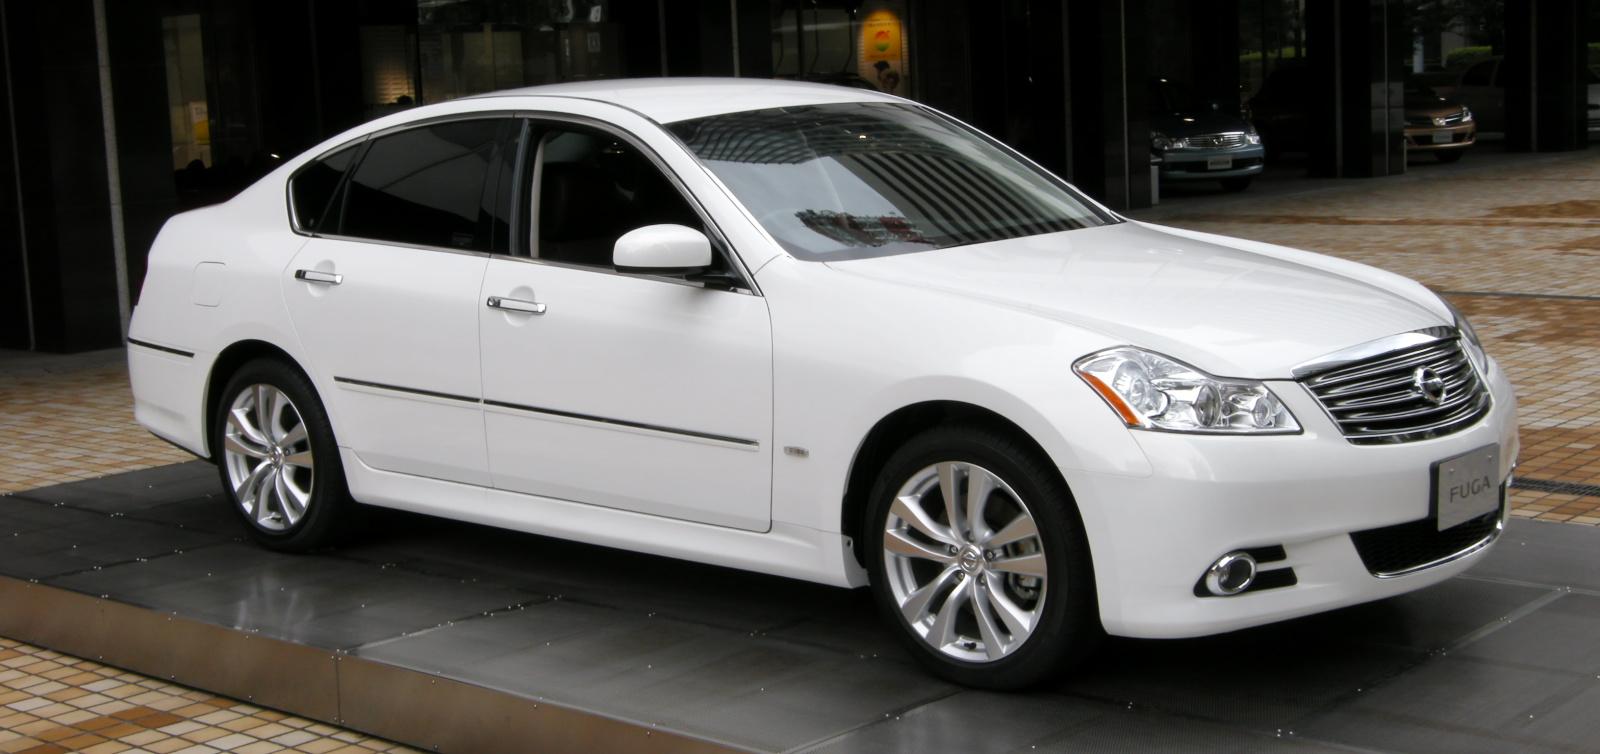 White 2011 Nissan Fuga